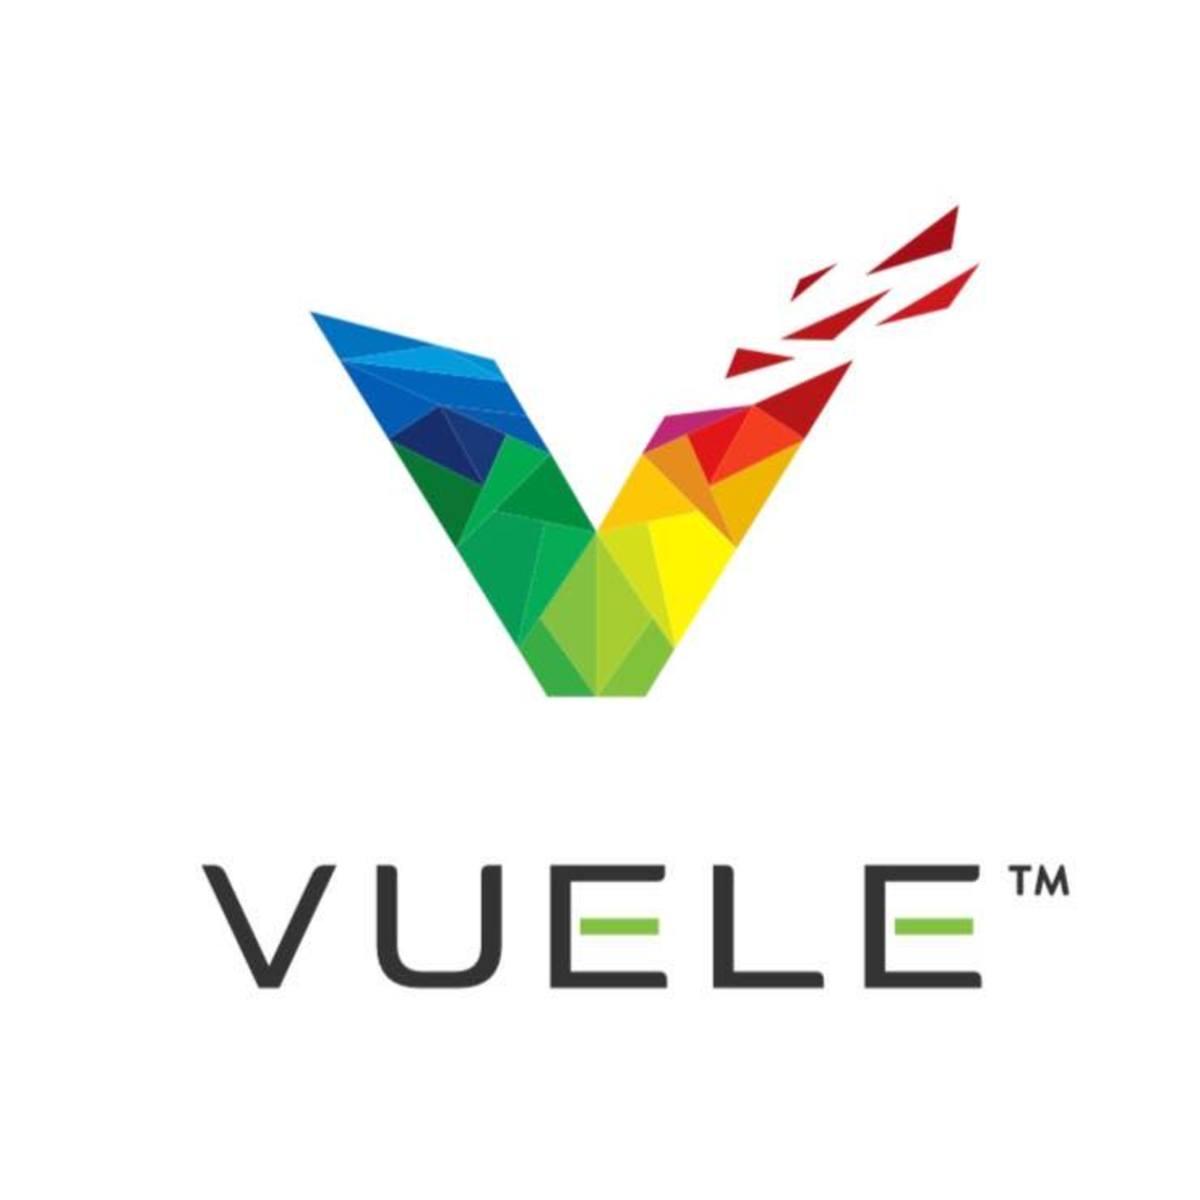 Vuele Logo